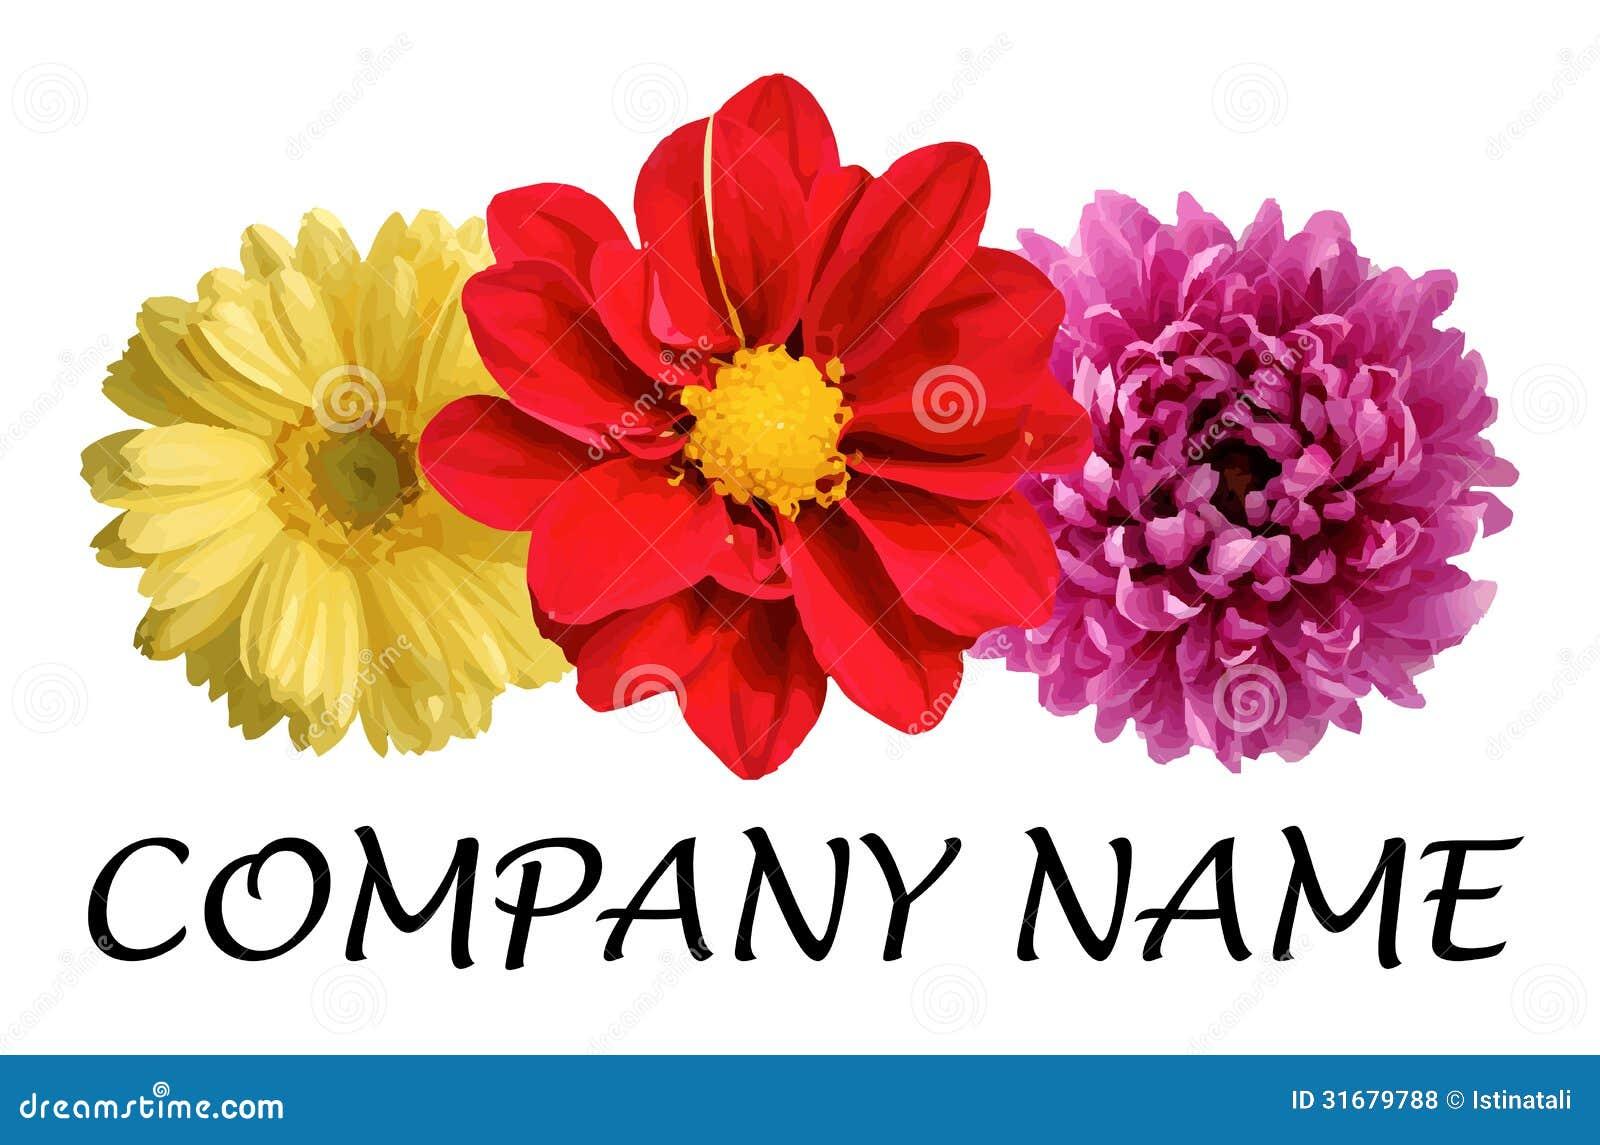 Flower Logo Royalty Free Stock Photos - Image: 31679788